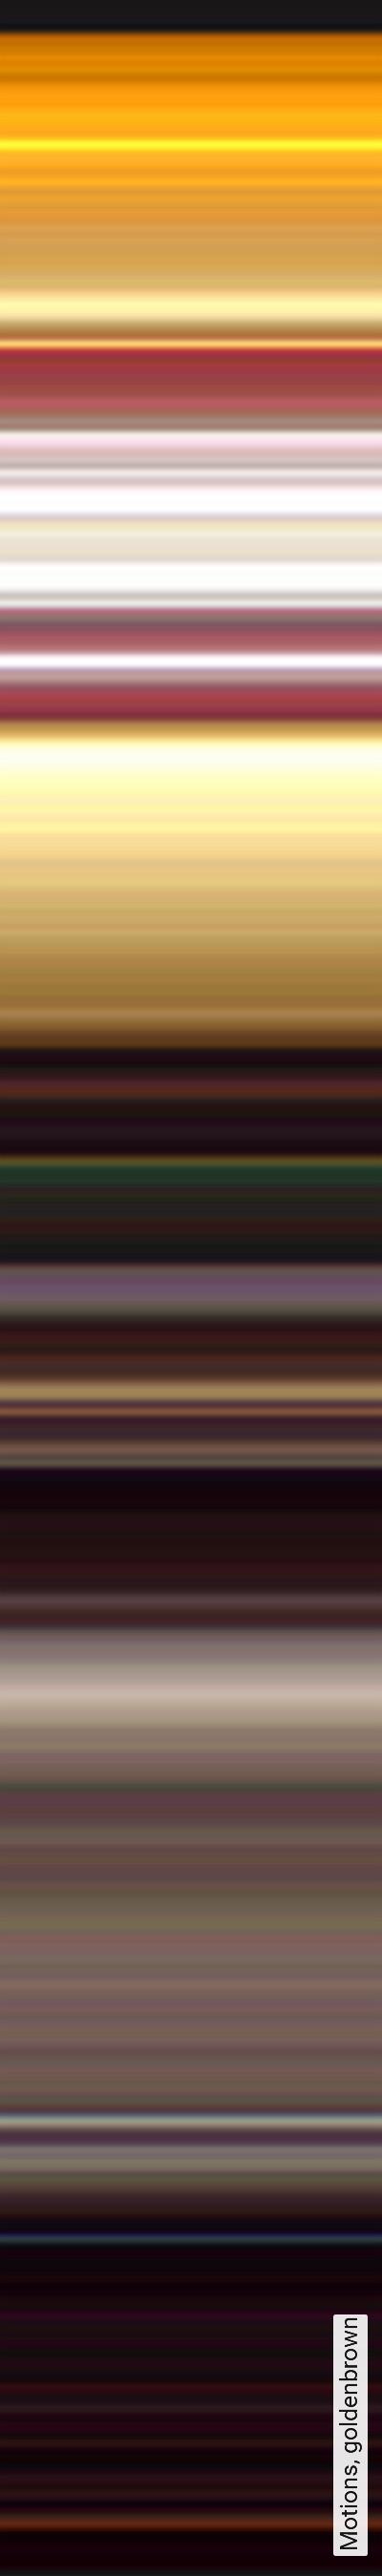 Bild: Tapeten - Motions, goldenbrown